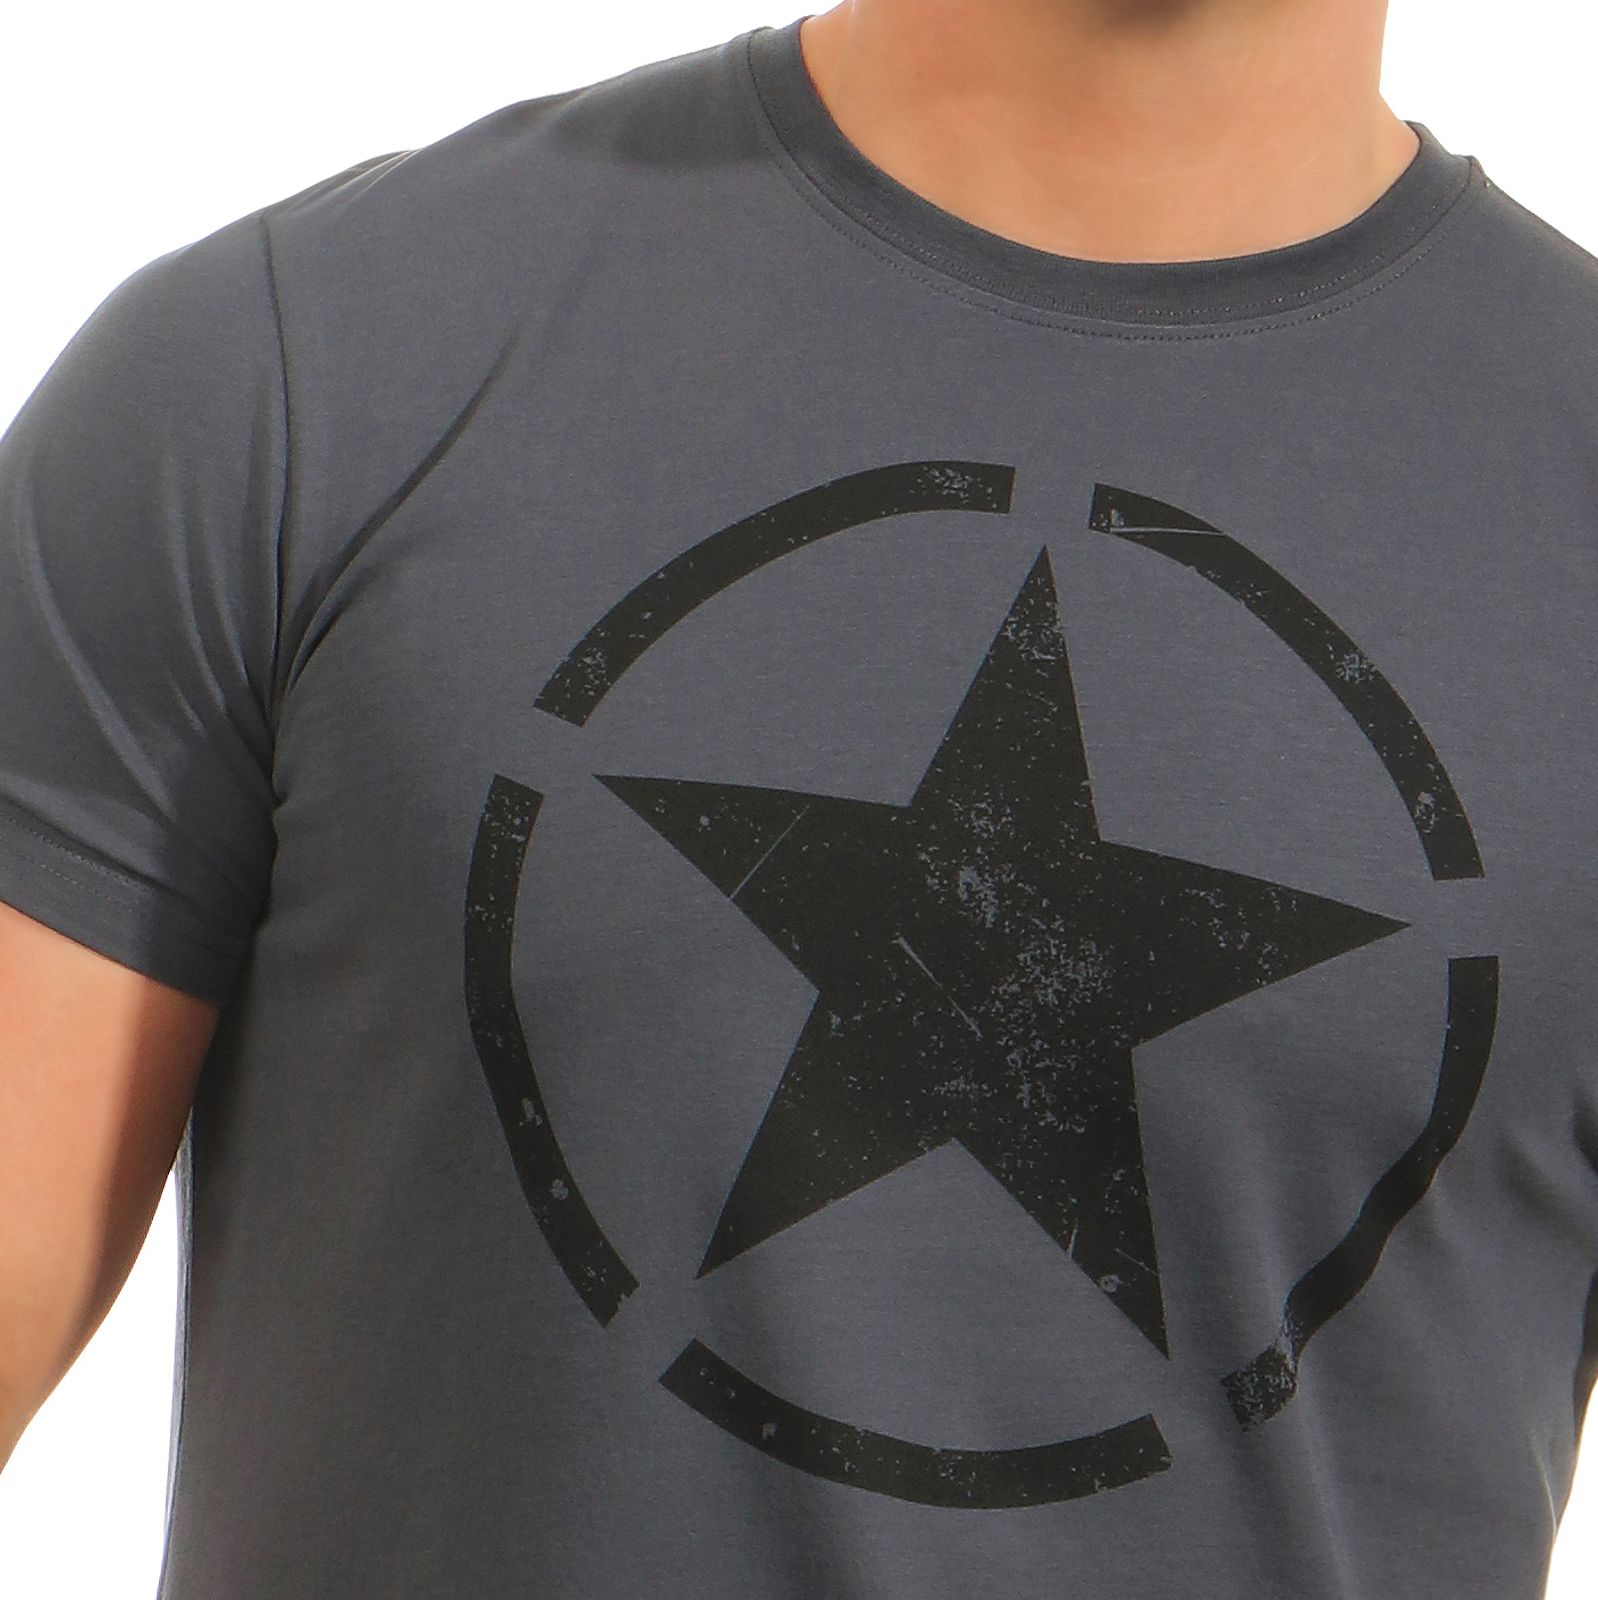 ee799e91860e x schliessen. Beschreibung. stylisches Männershirt von Alpha Industries ...